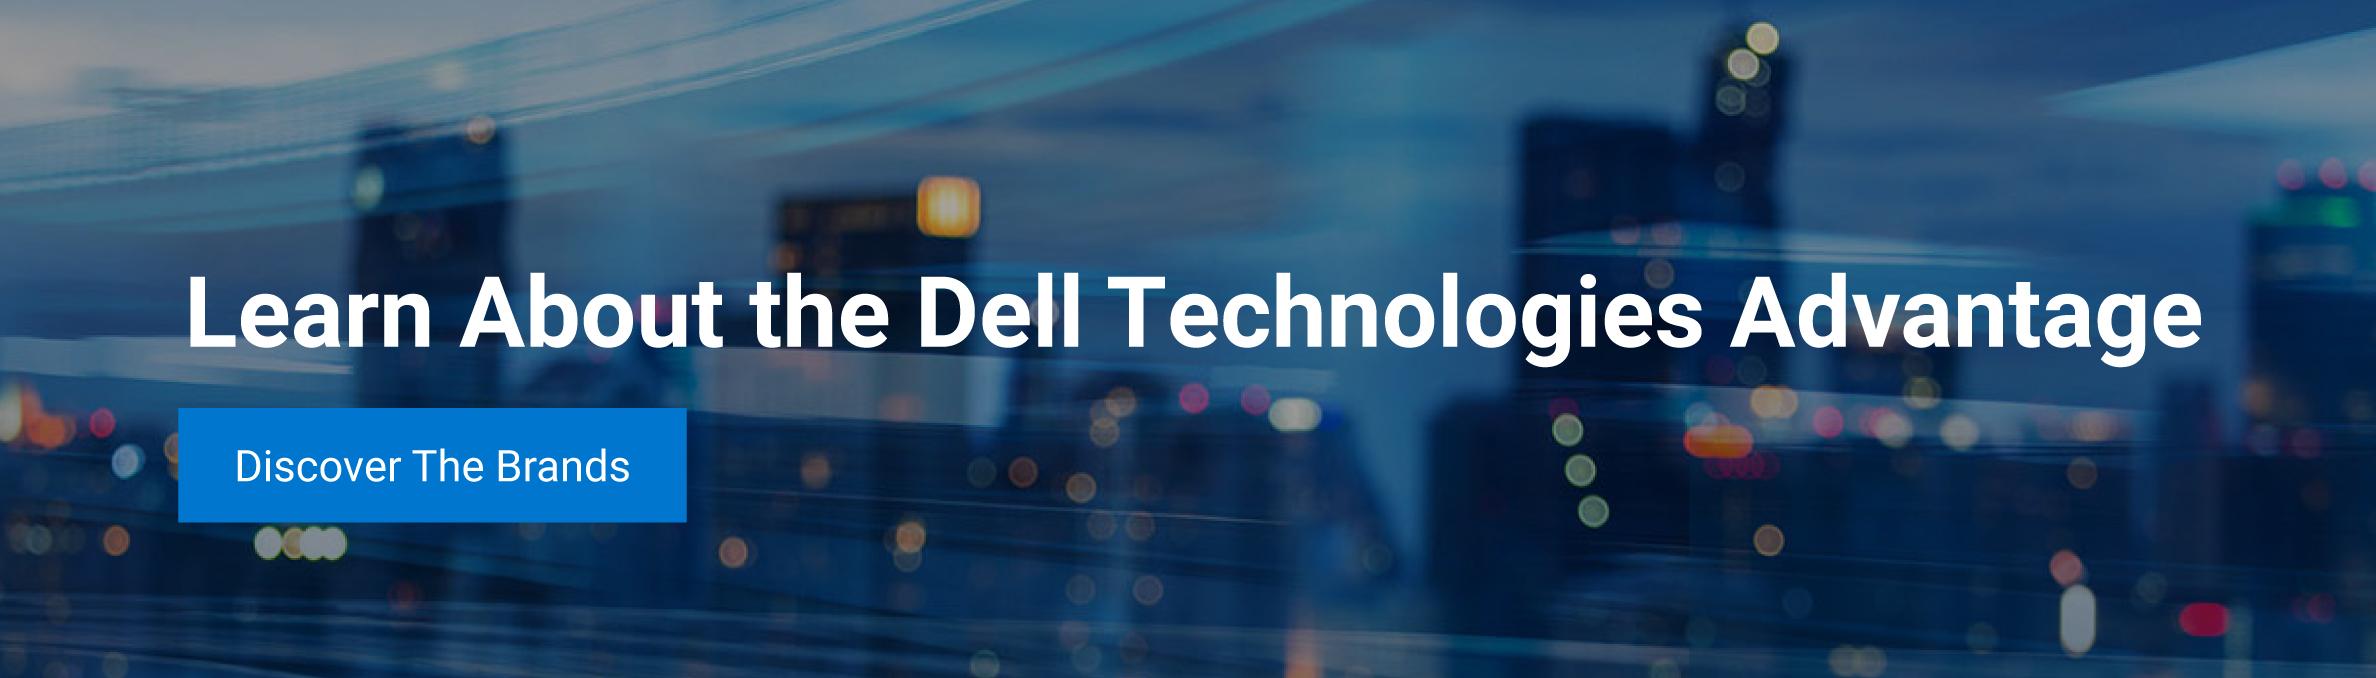 Dell Tech Microsite-02.jpg